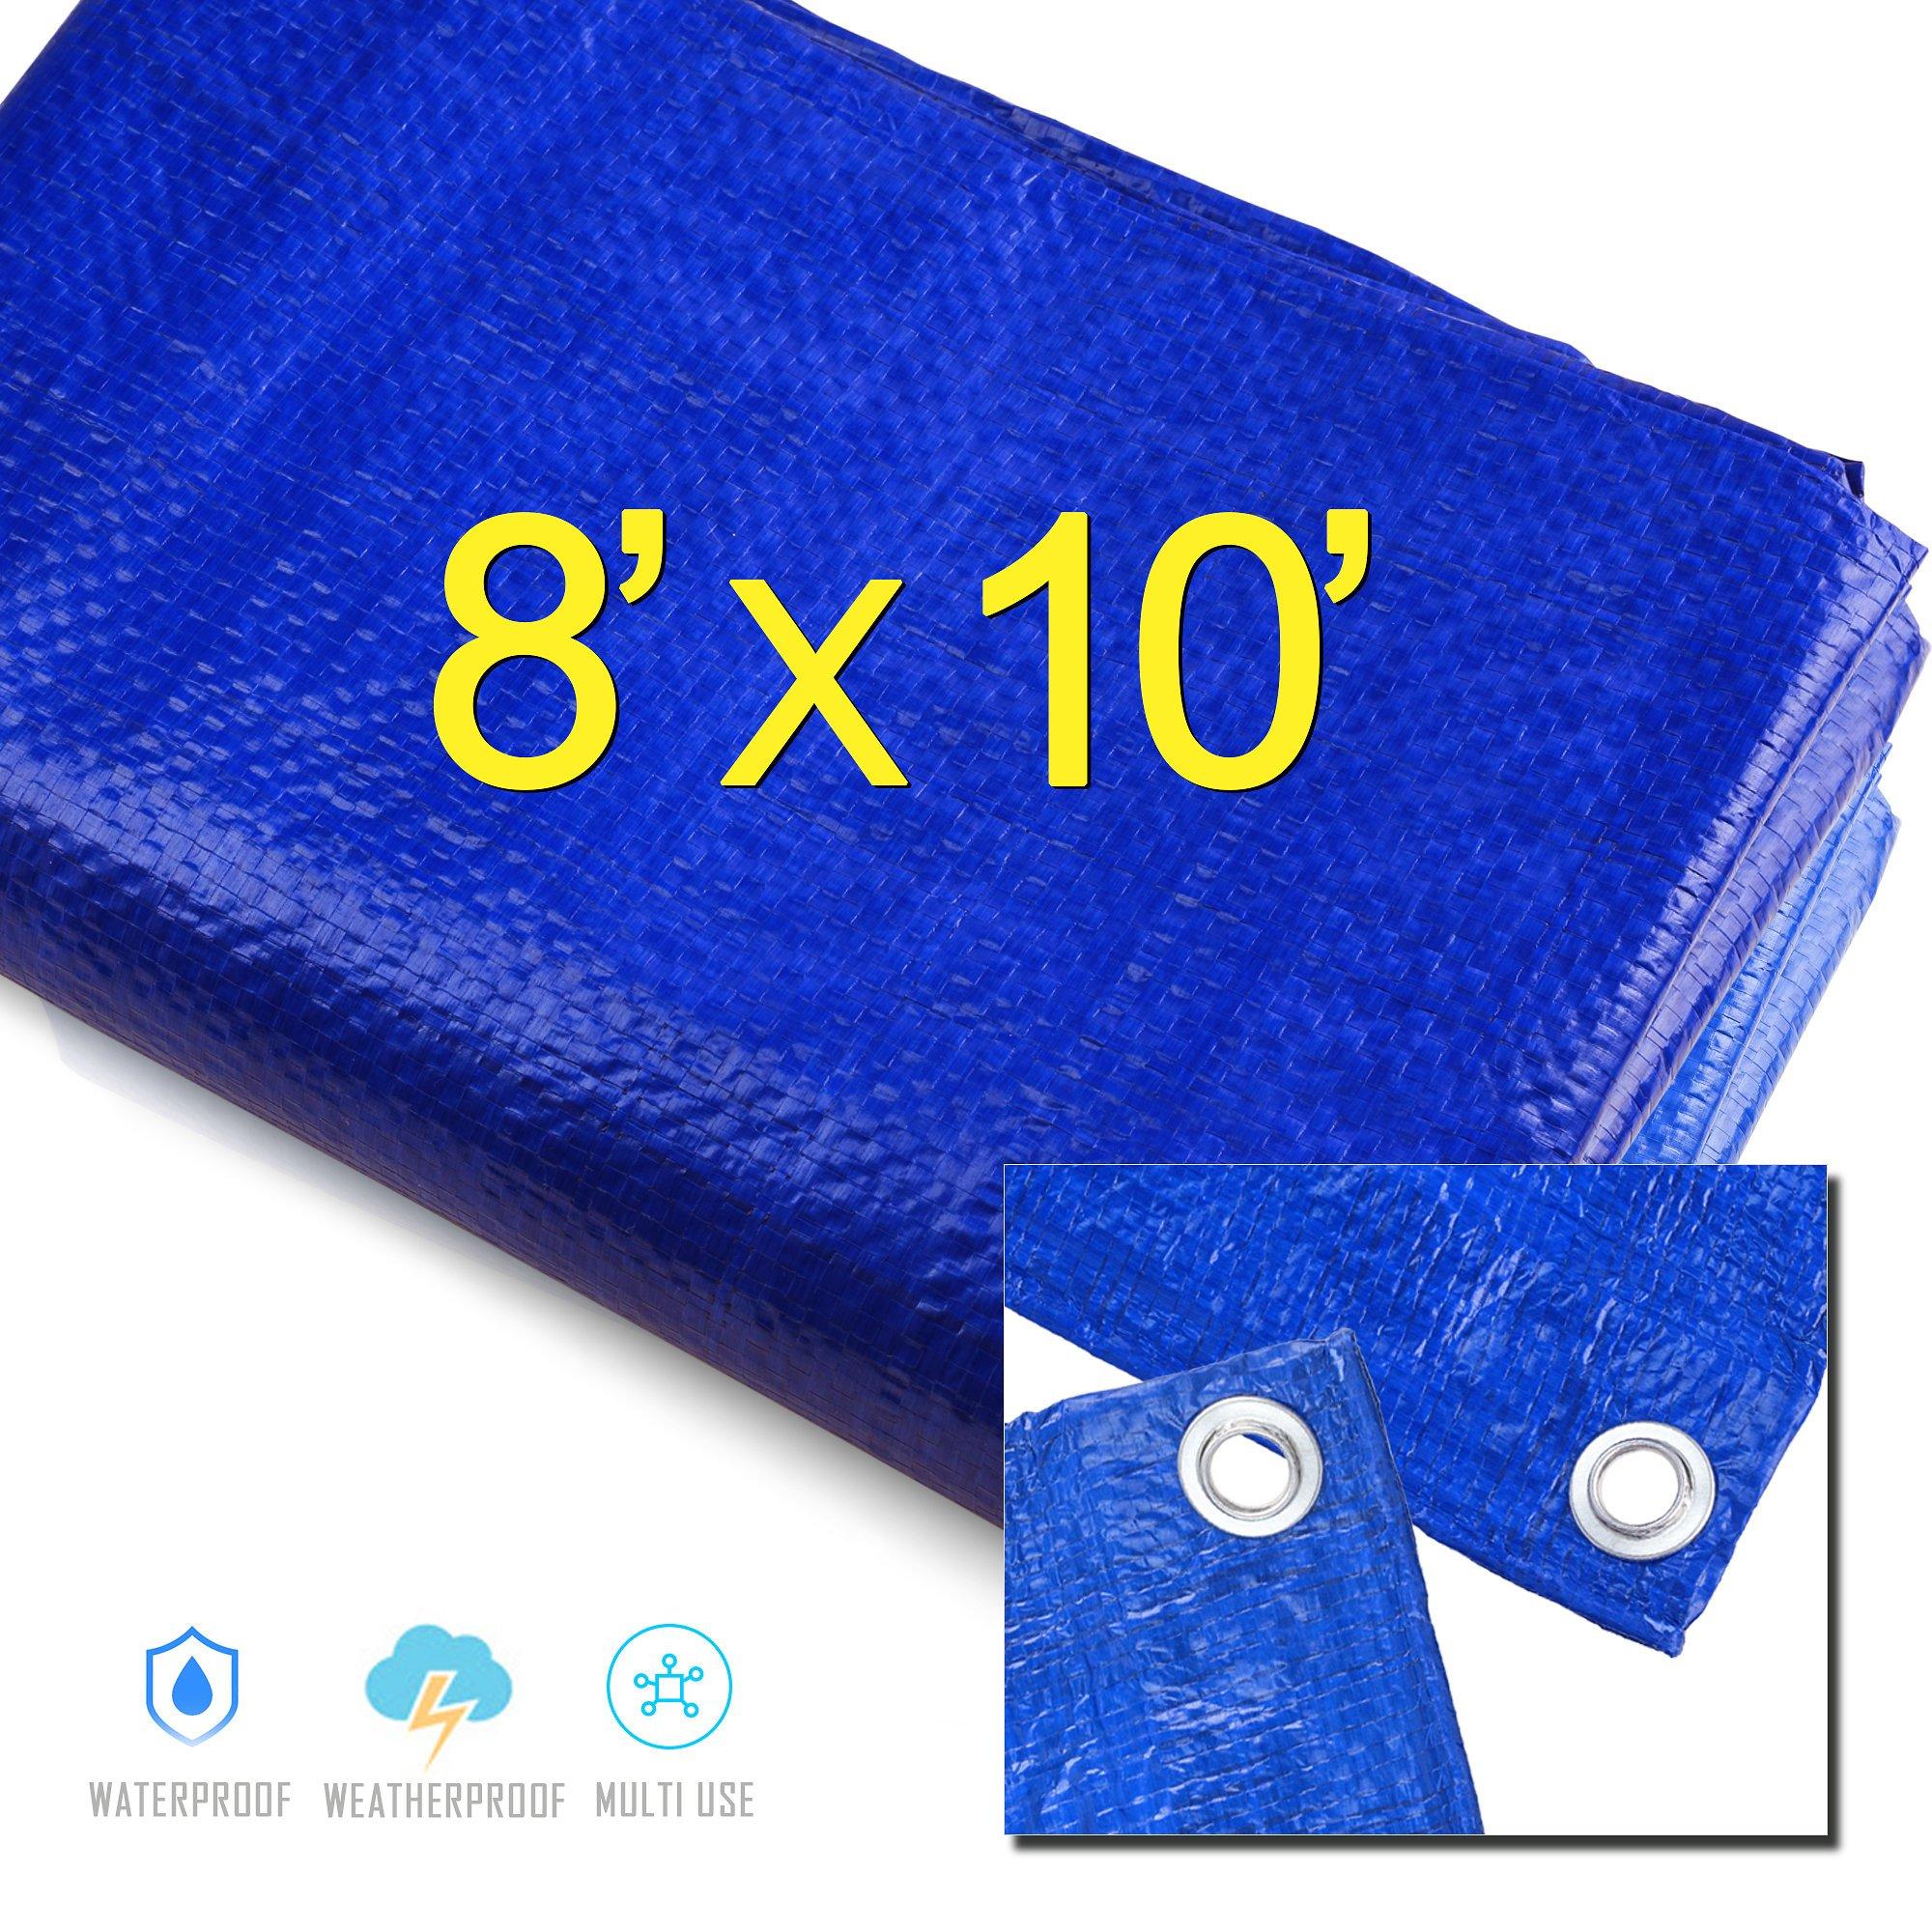 8' X 10' Blue Multi-purpose Waterproof Poly Tarp Cover Tent Shelter Camping Tarpaulin By Prime Tarps